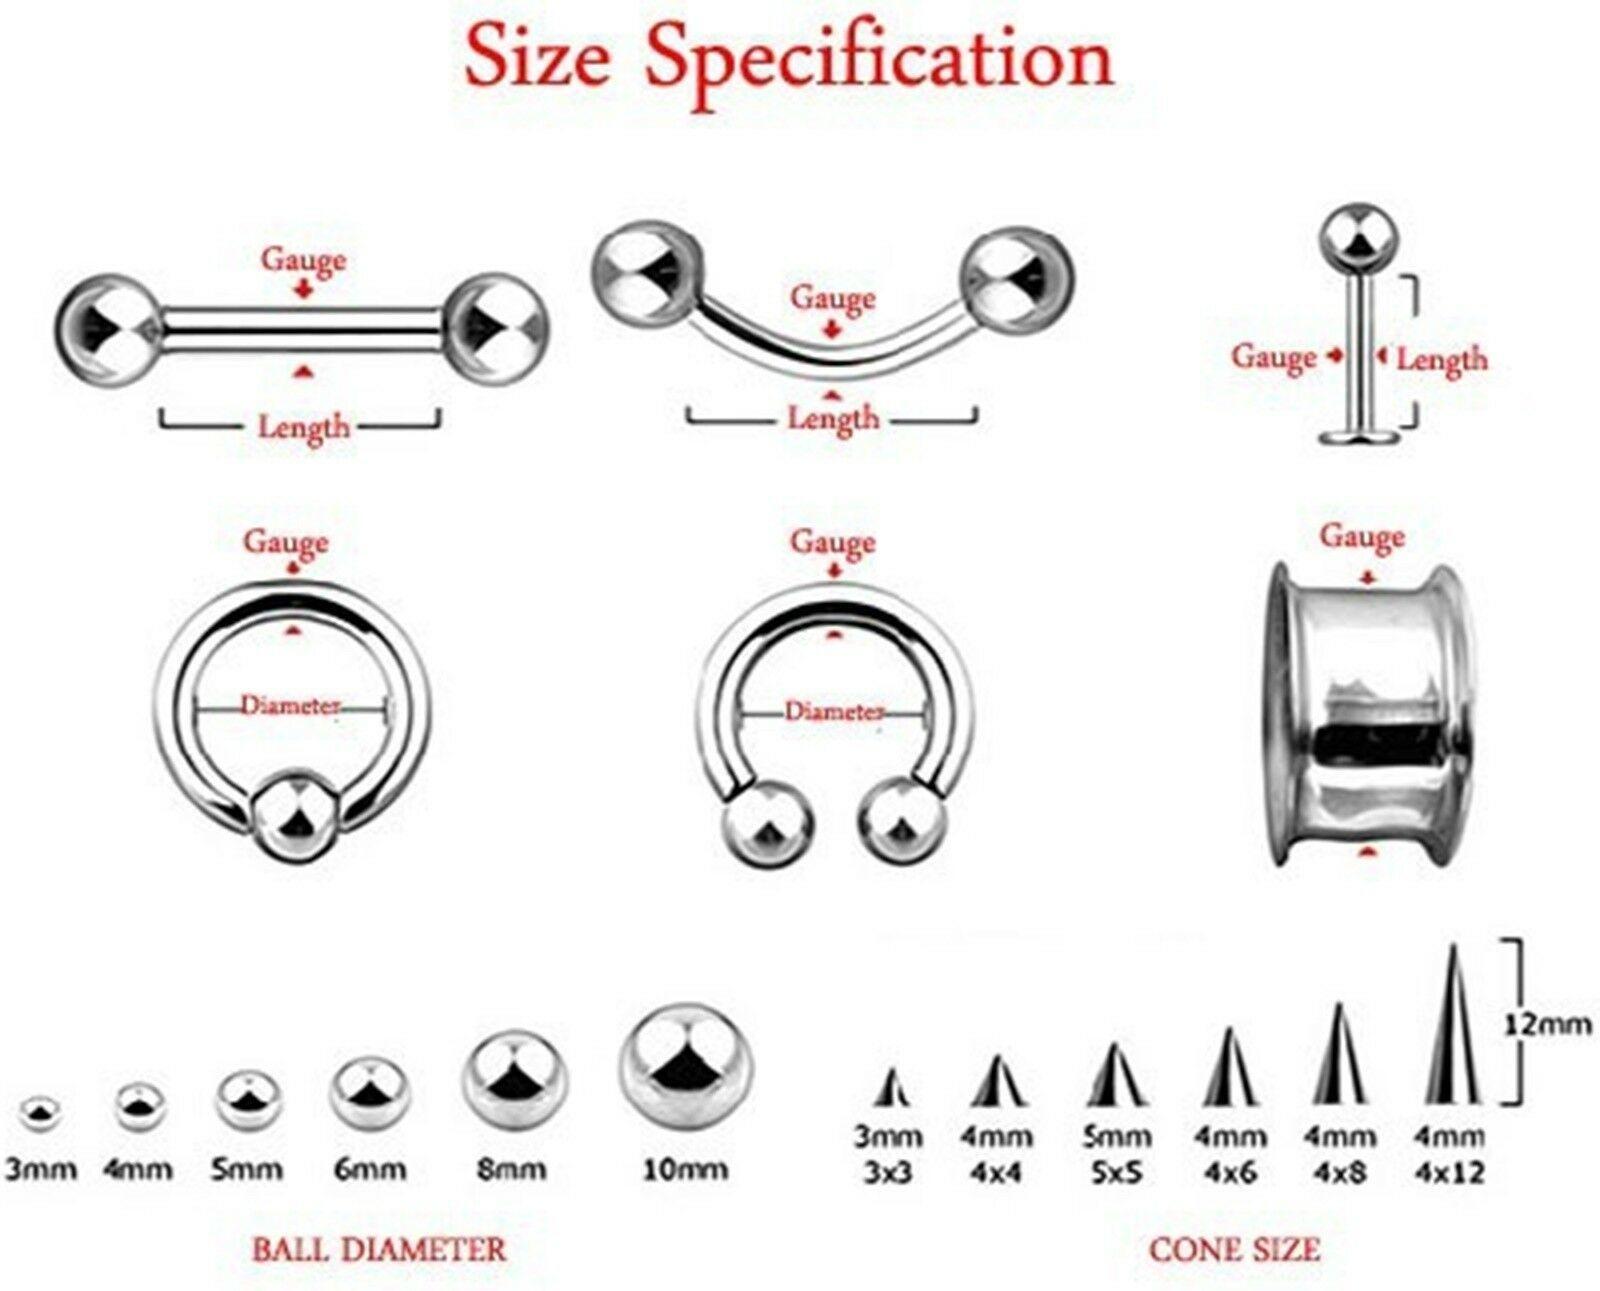 Barbell Tongue Nipple Ring Heavy 2 Gauge 1 2 10mm Balls Steel Body Jewelry